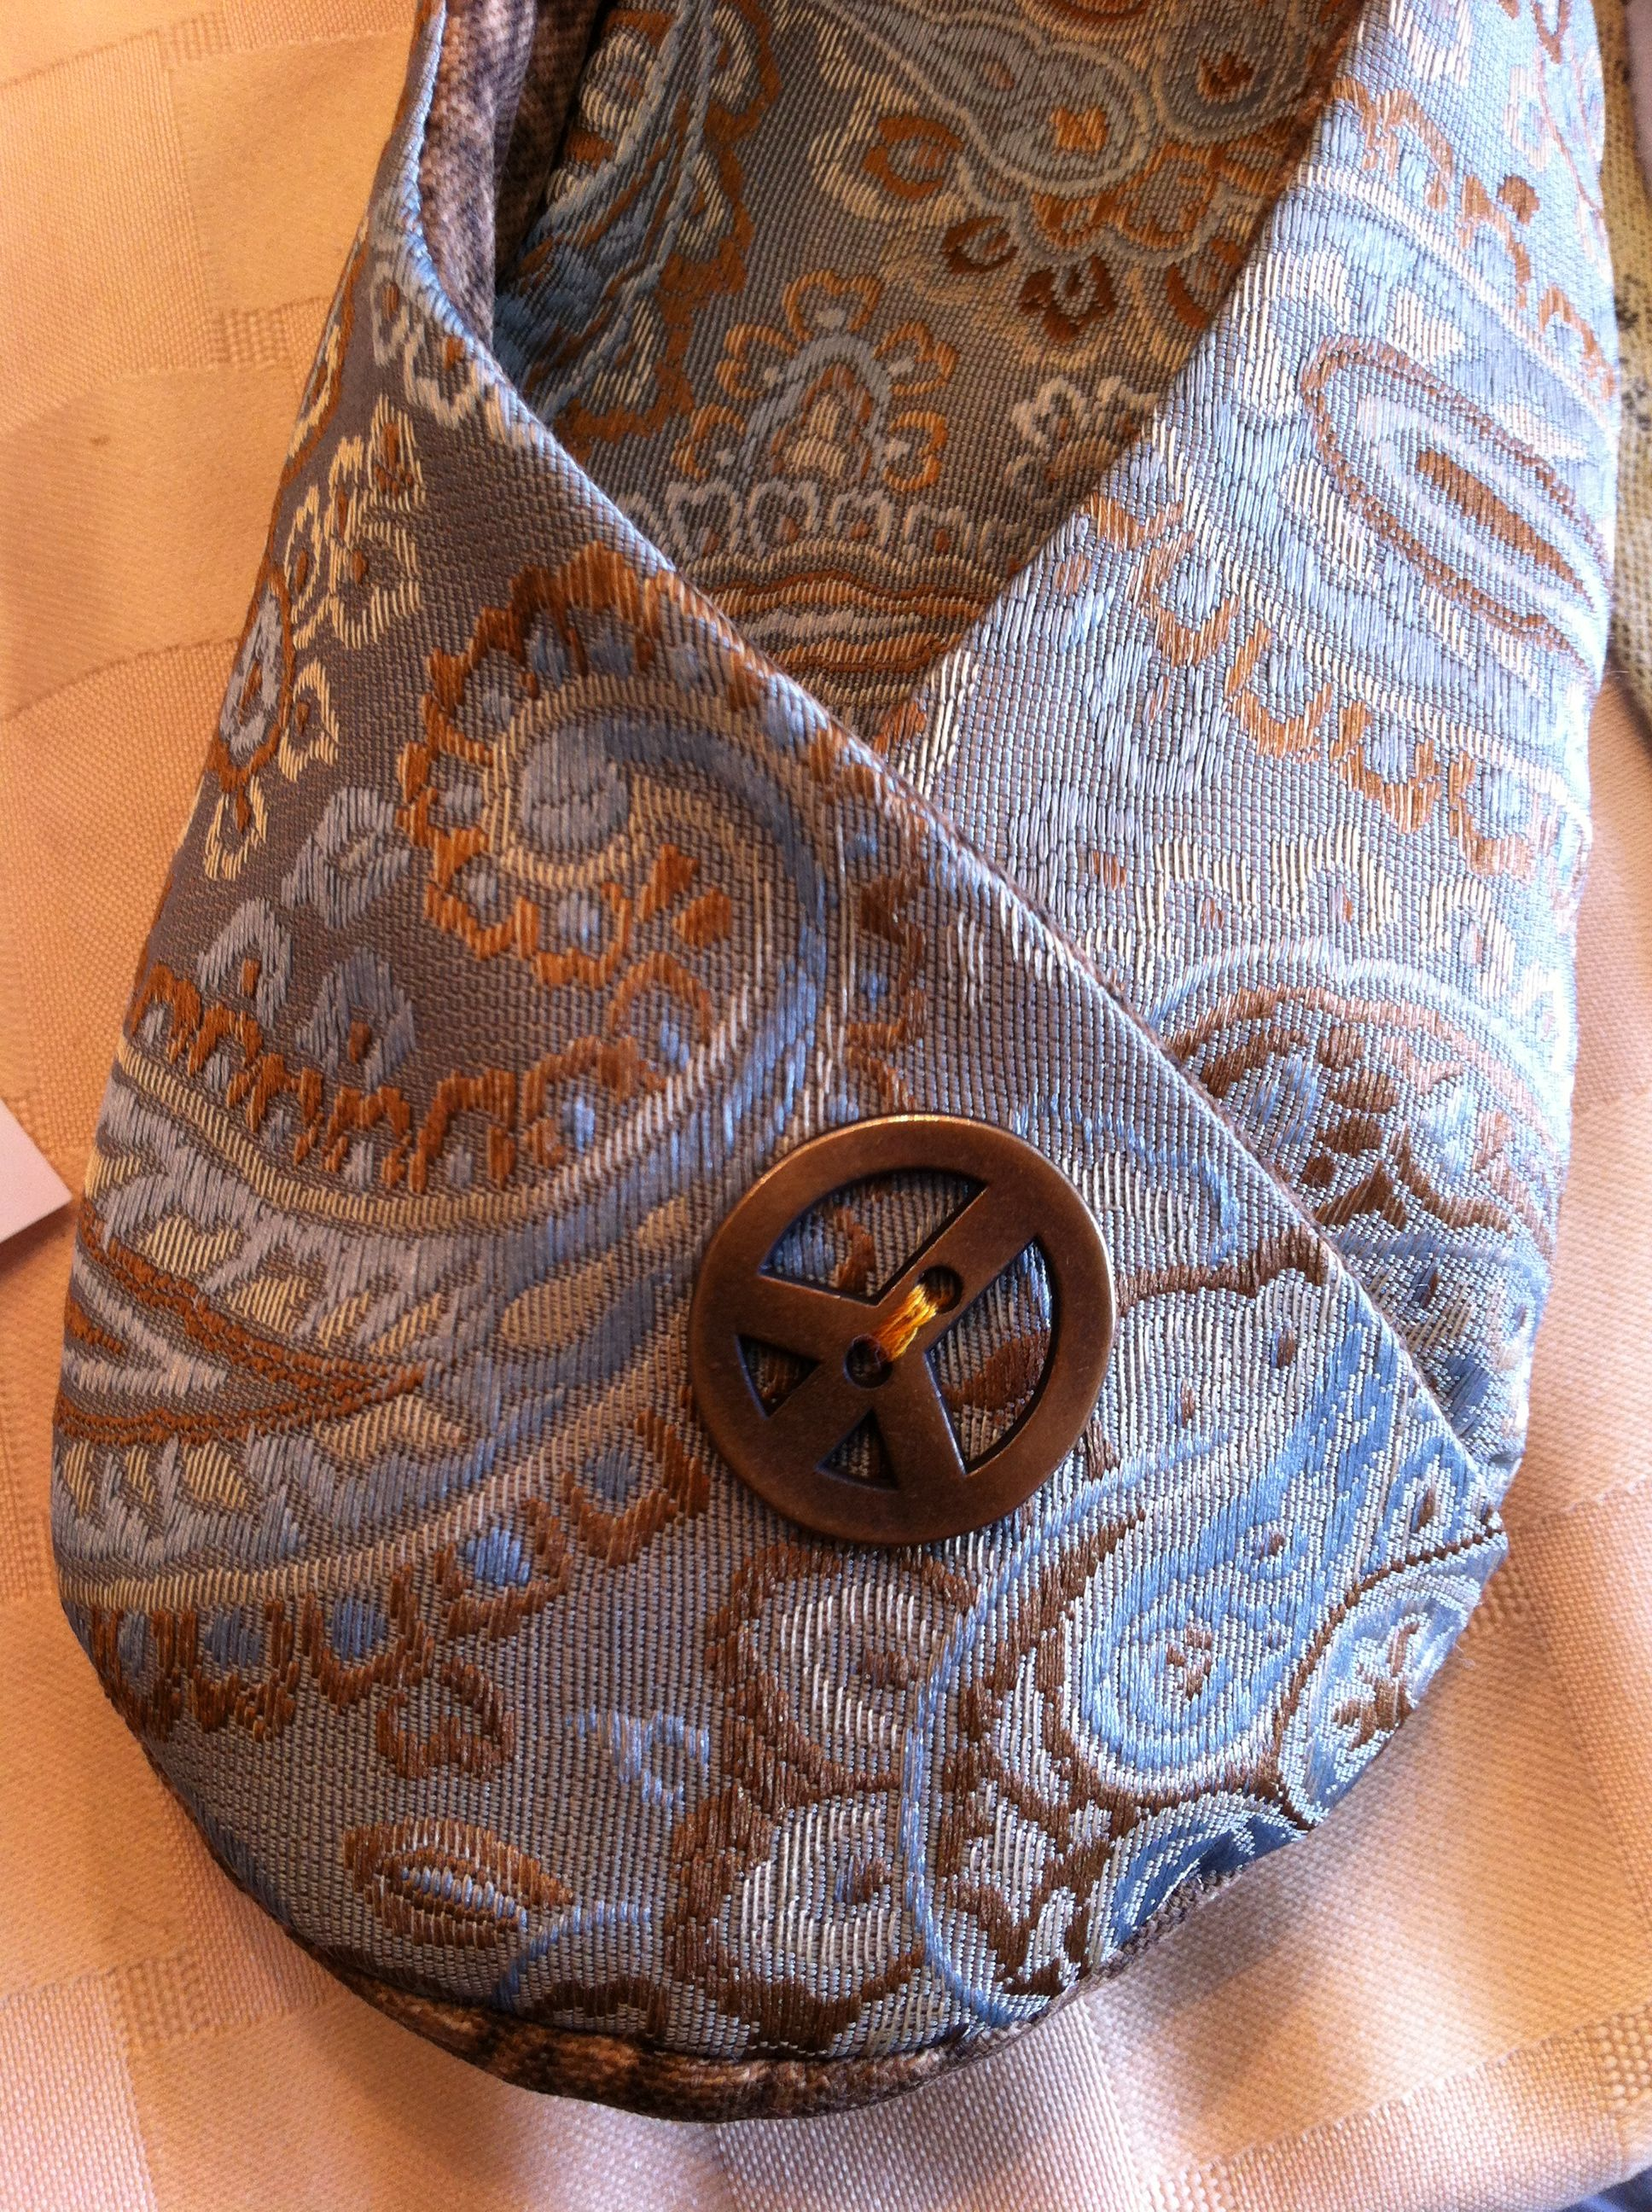 Handmade kimono slipper Slippers, Sewing projects, Cuff